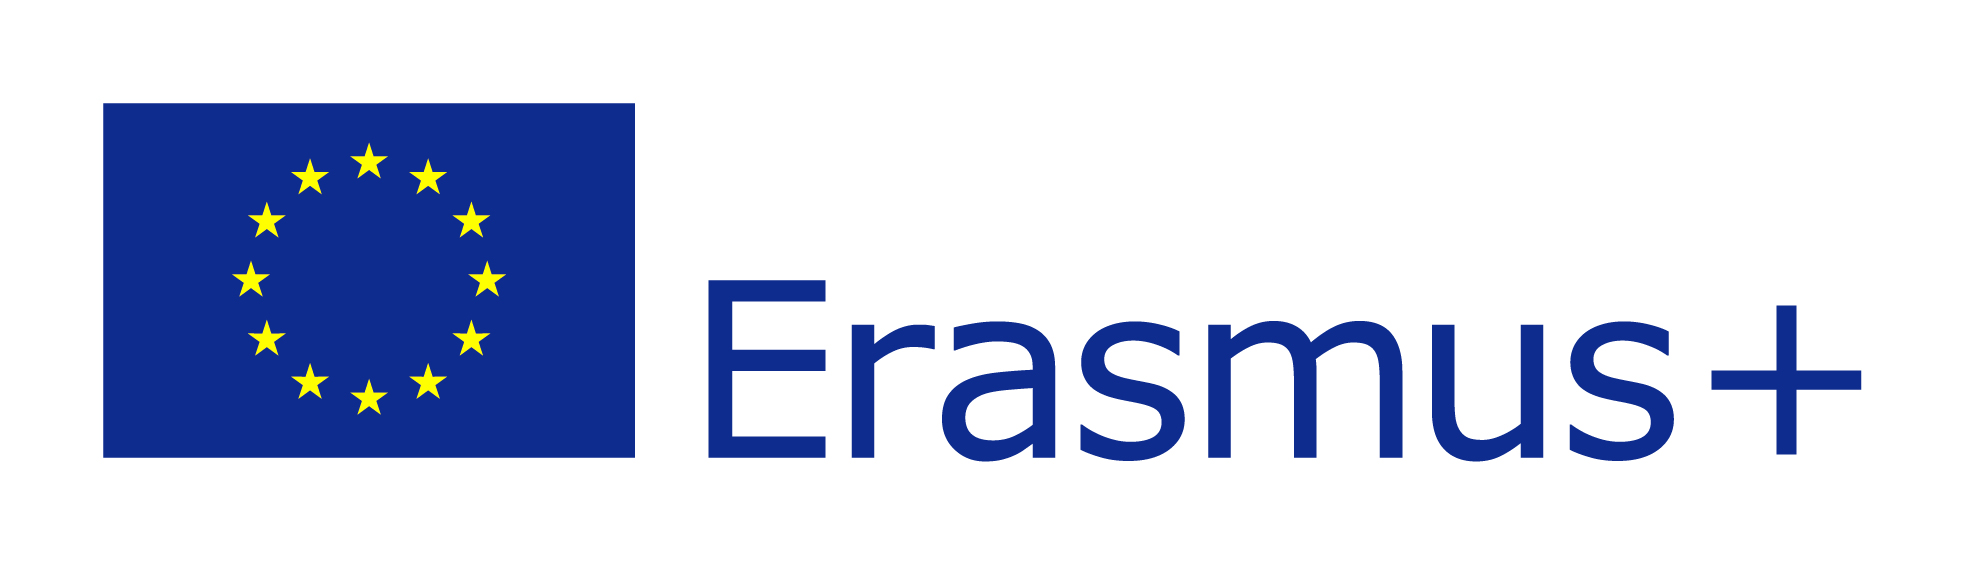 EU flag-Erasmus vect POS